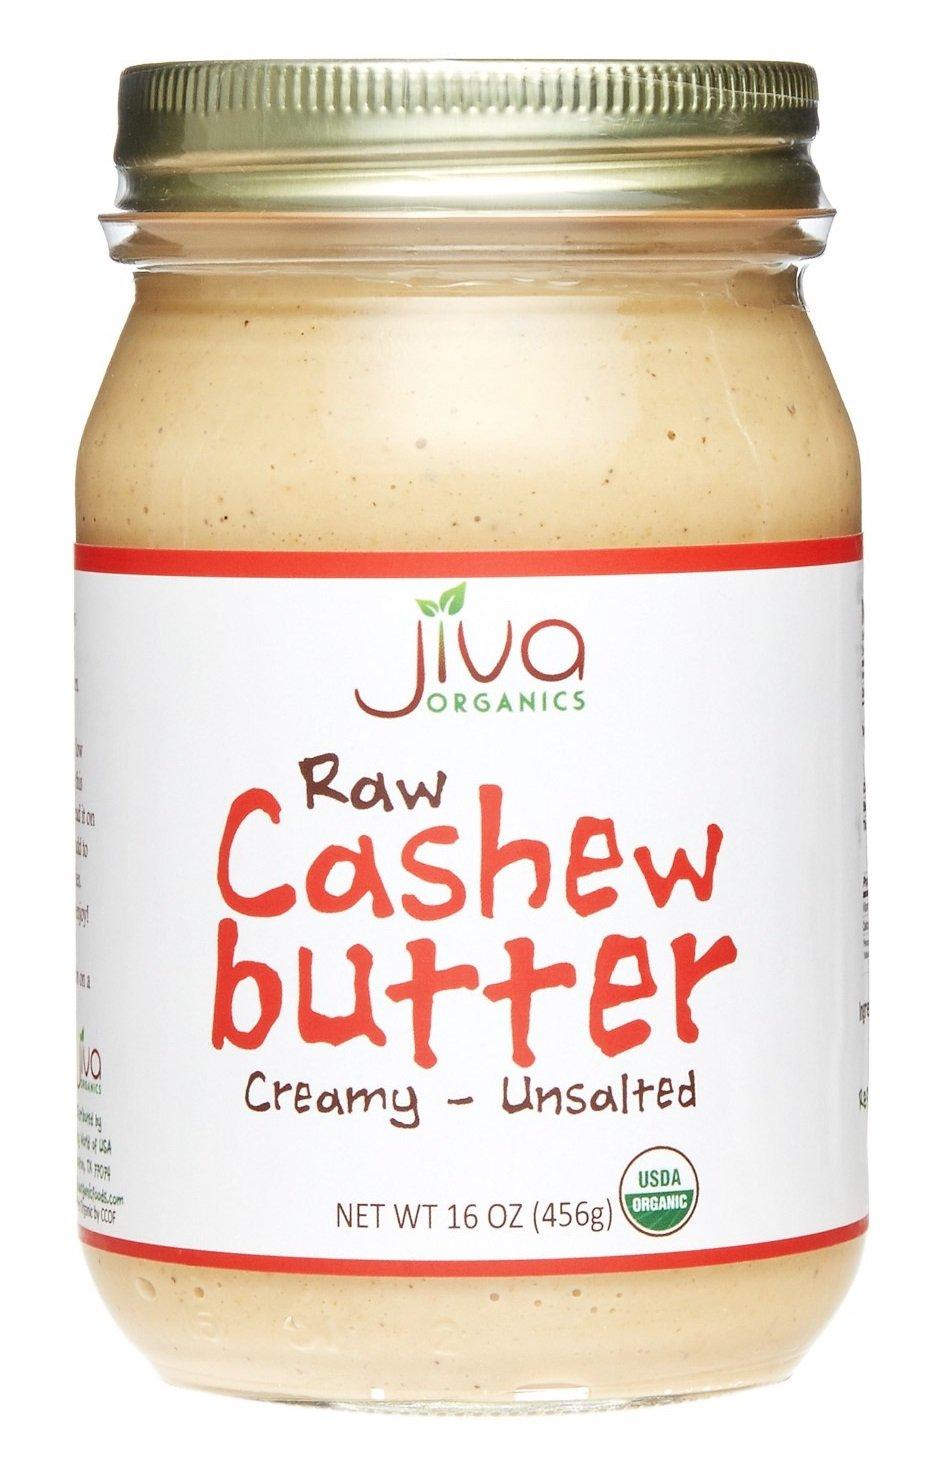 Jiva Organics RAW Organic Cashew Butter 16-Ounce Jar